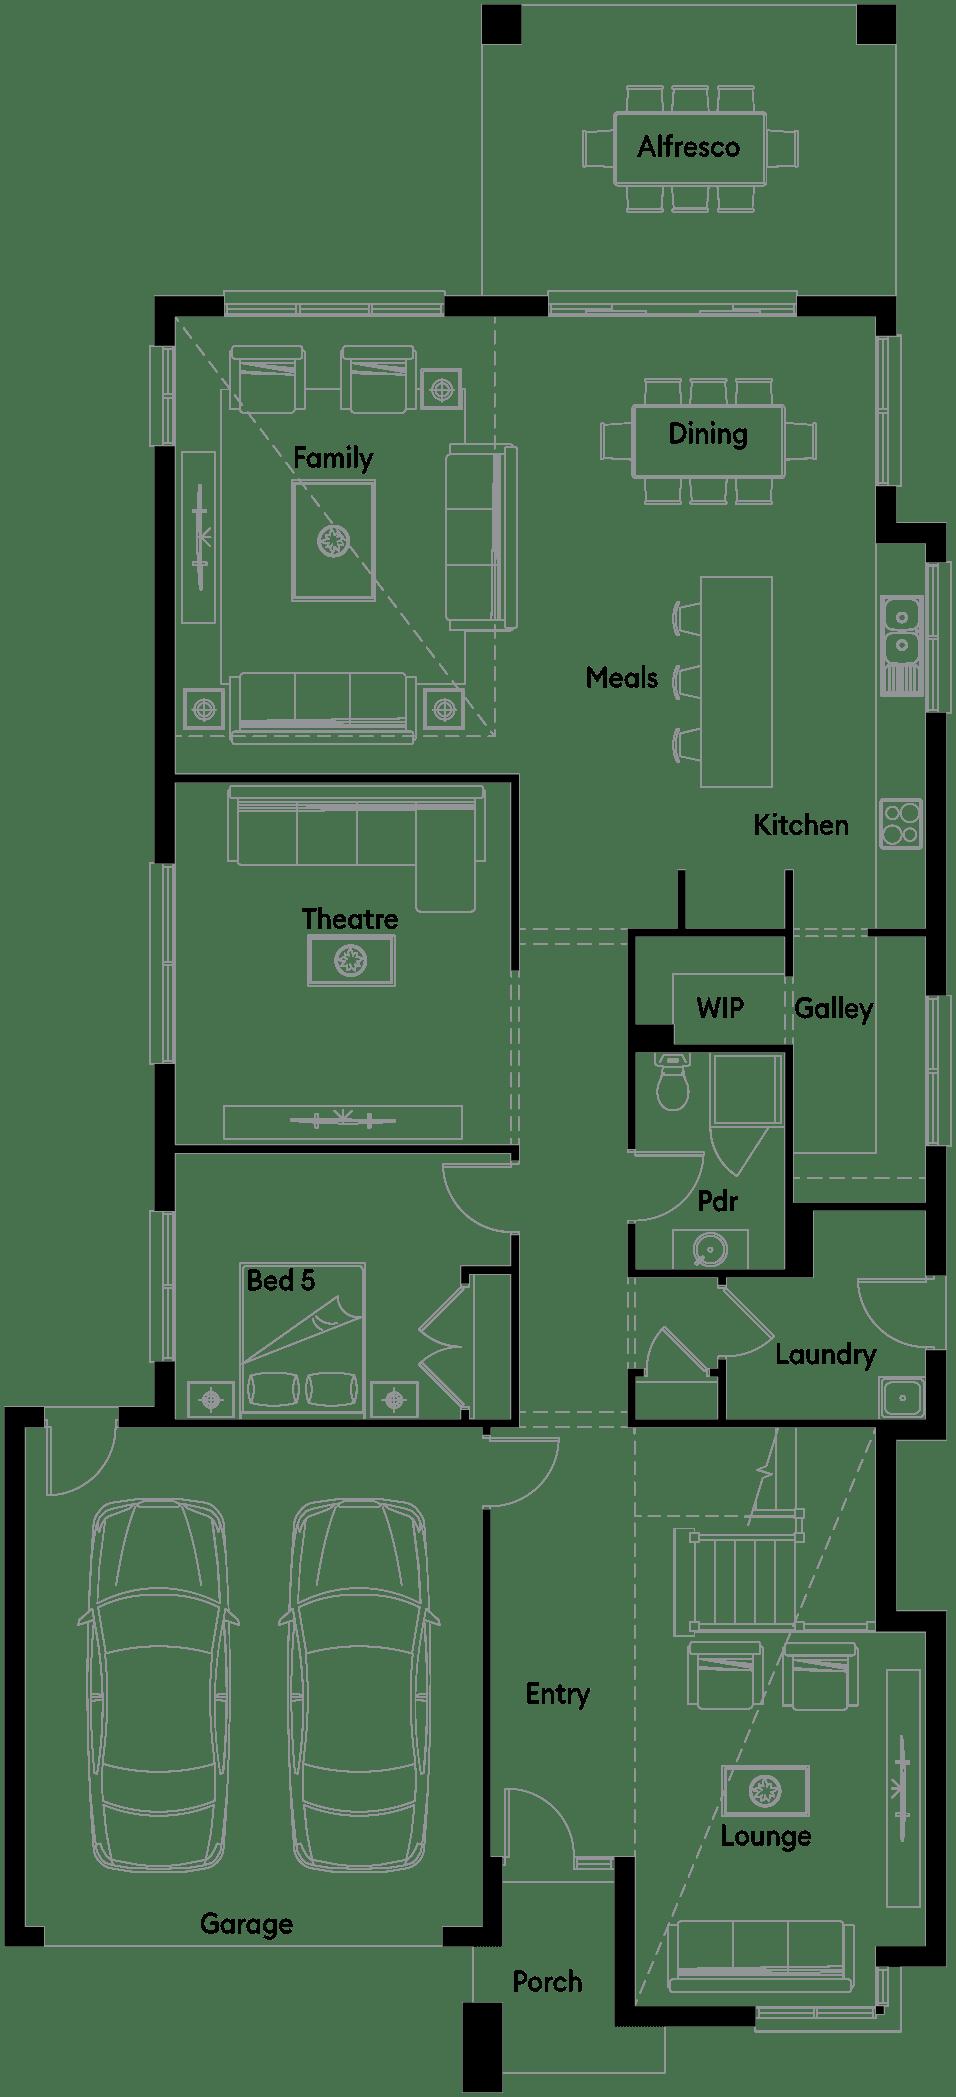 FloorPlan1_HOUSE850_Bristol_Grange_43-01